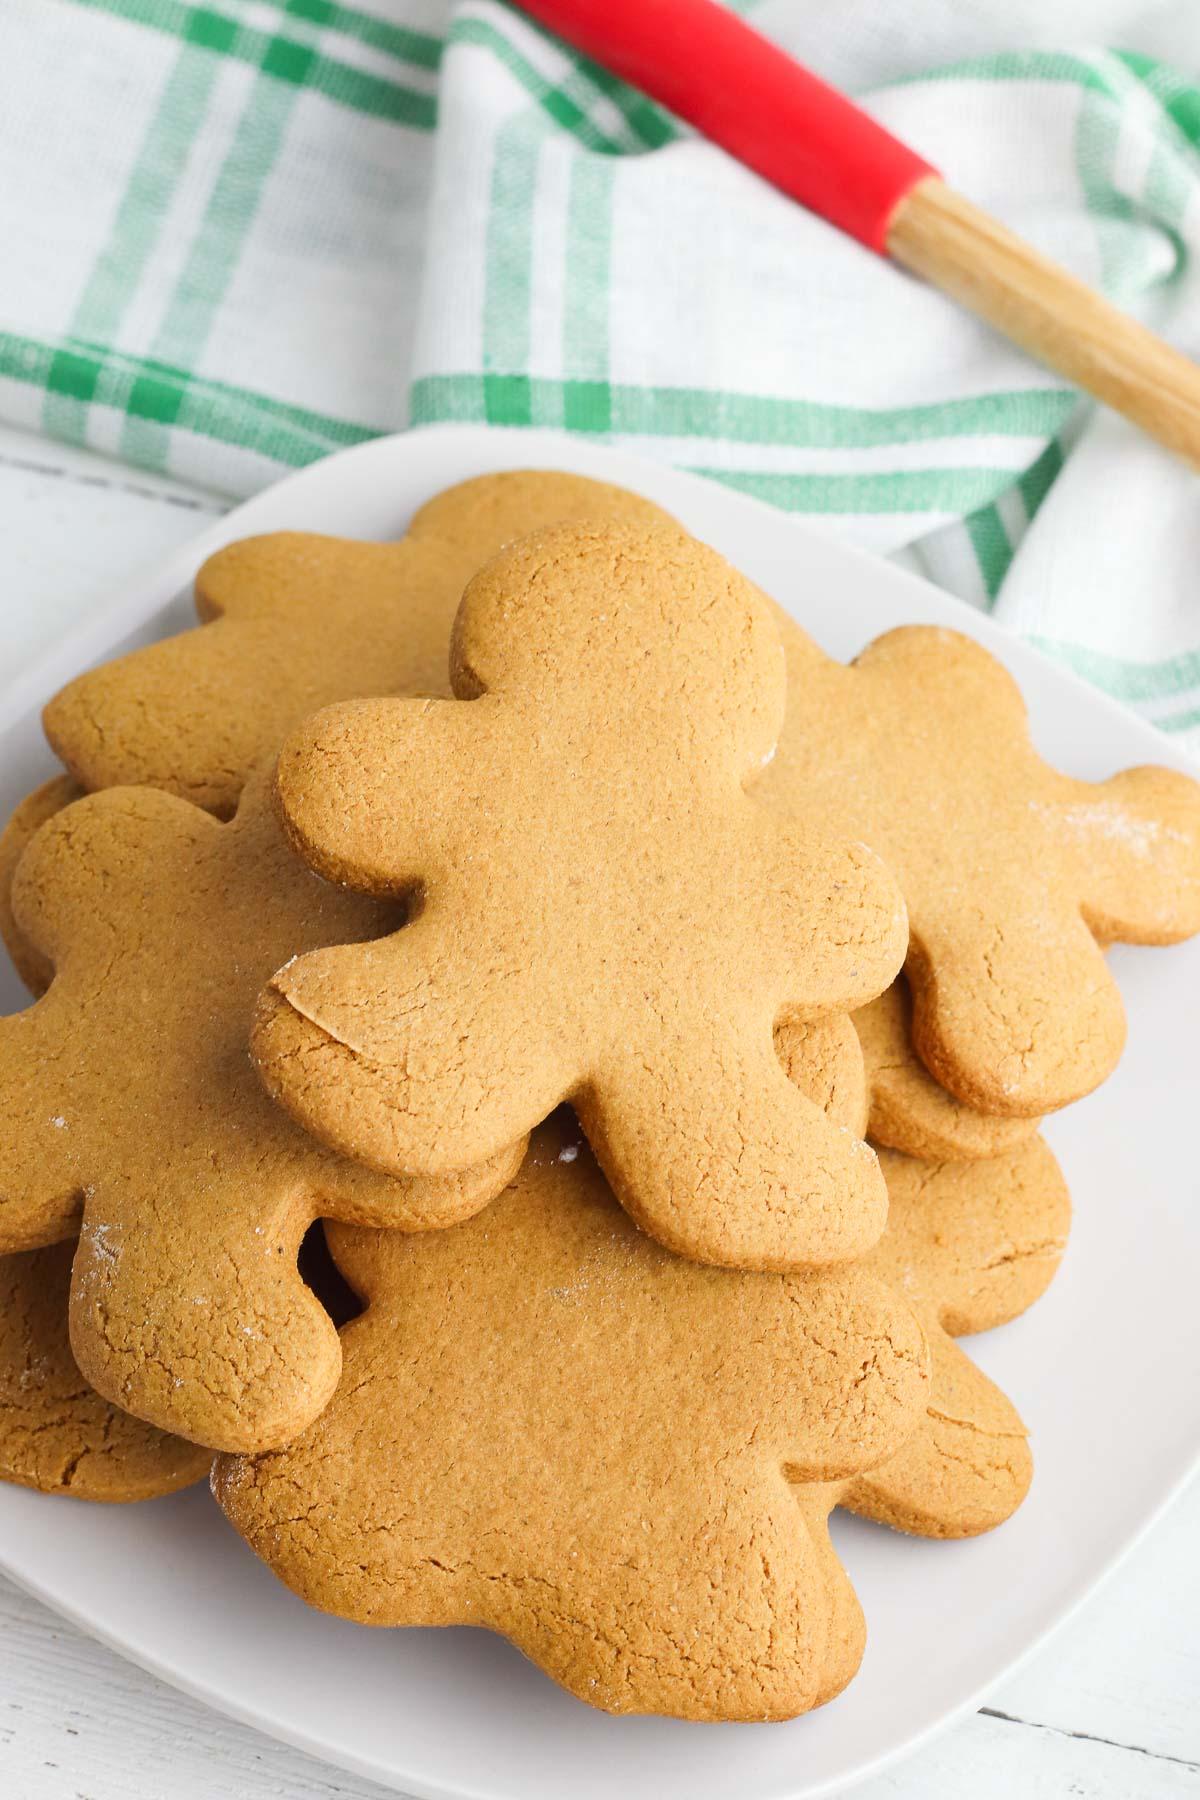 pile of gingerbread men cookies